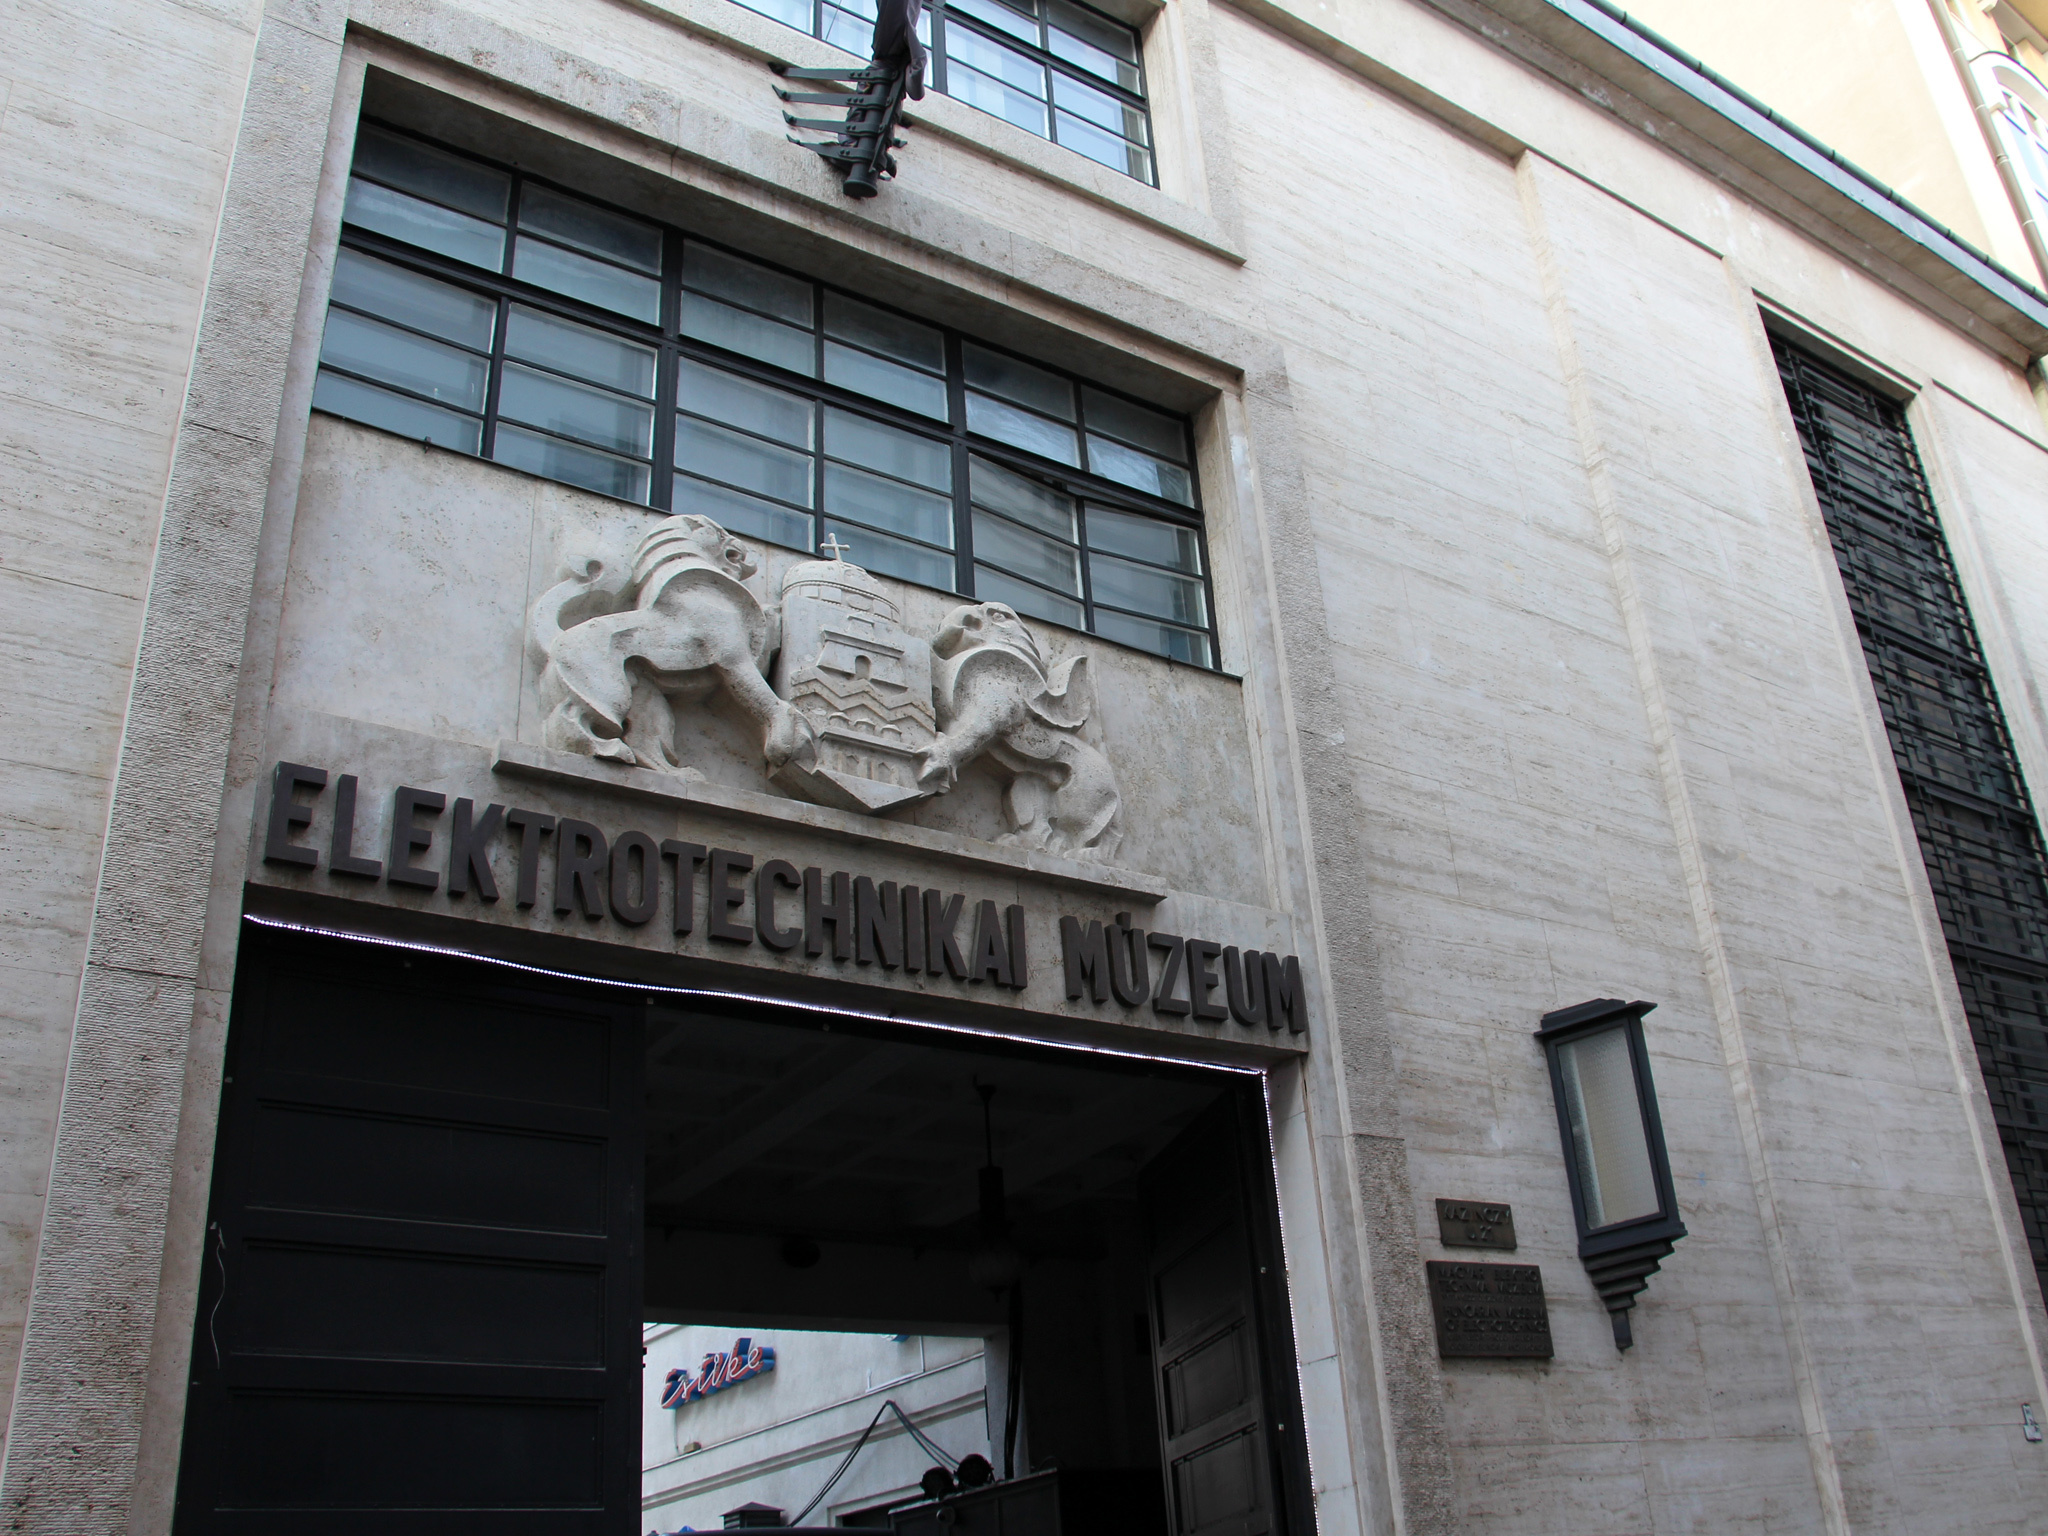 Entrance to Elektrotechnikai Muzeum in Budapest